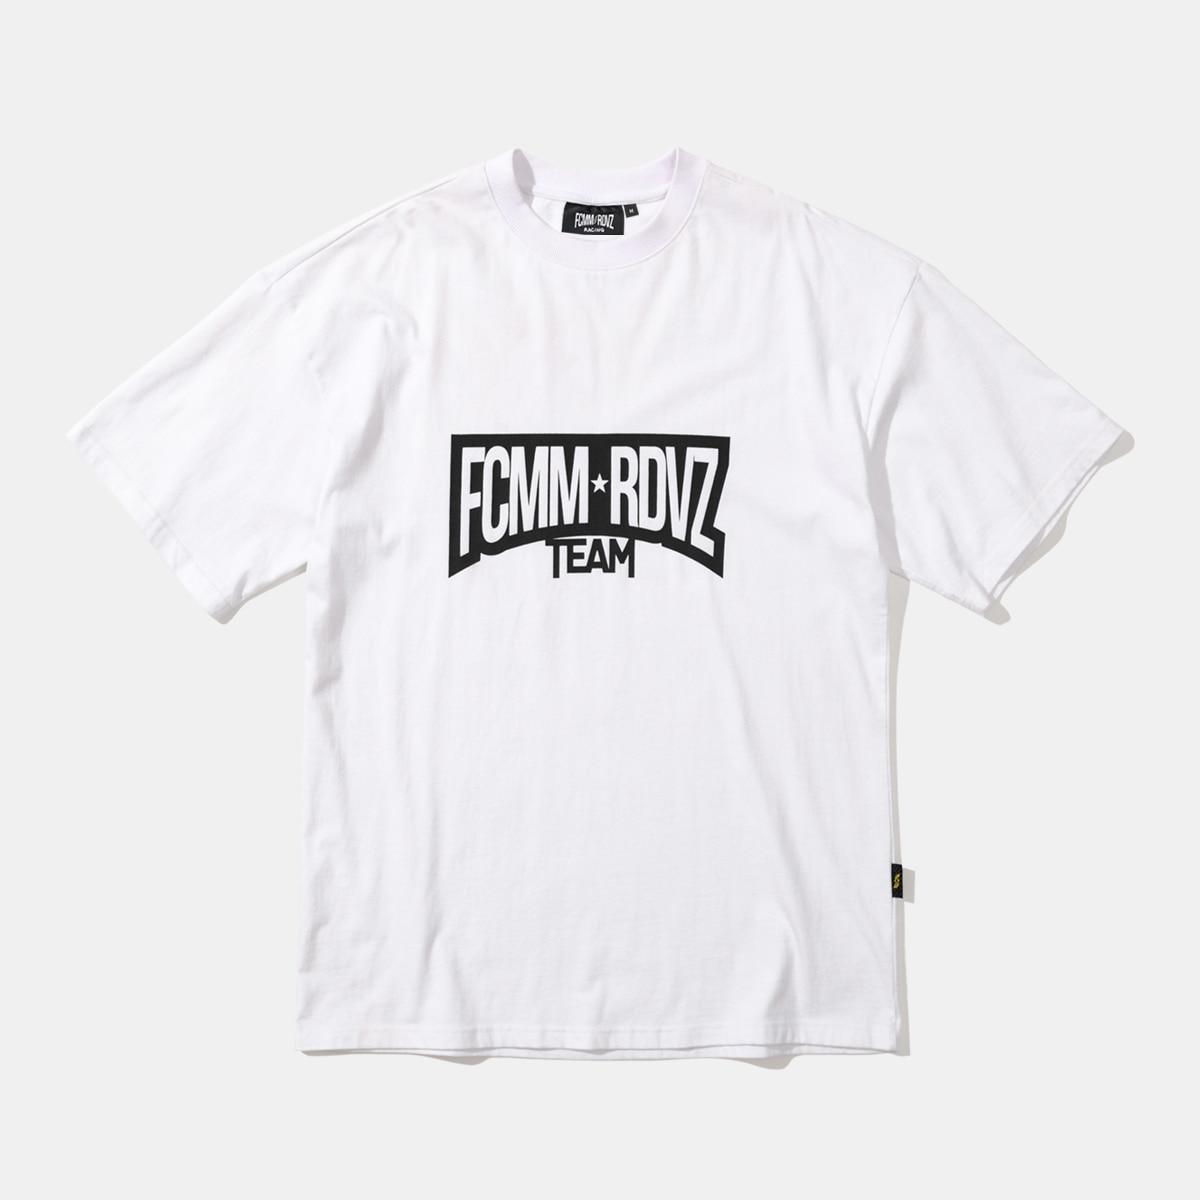 FCMM X RDVZ 레이싱 팀 티셔츠 - 화이트